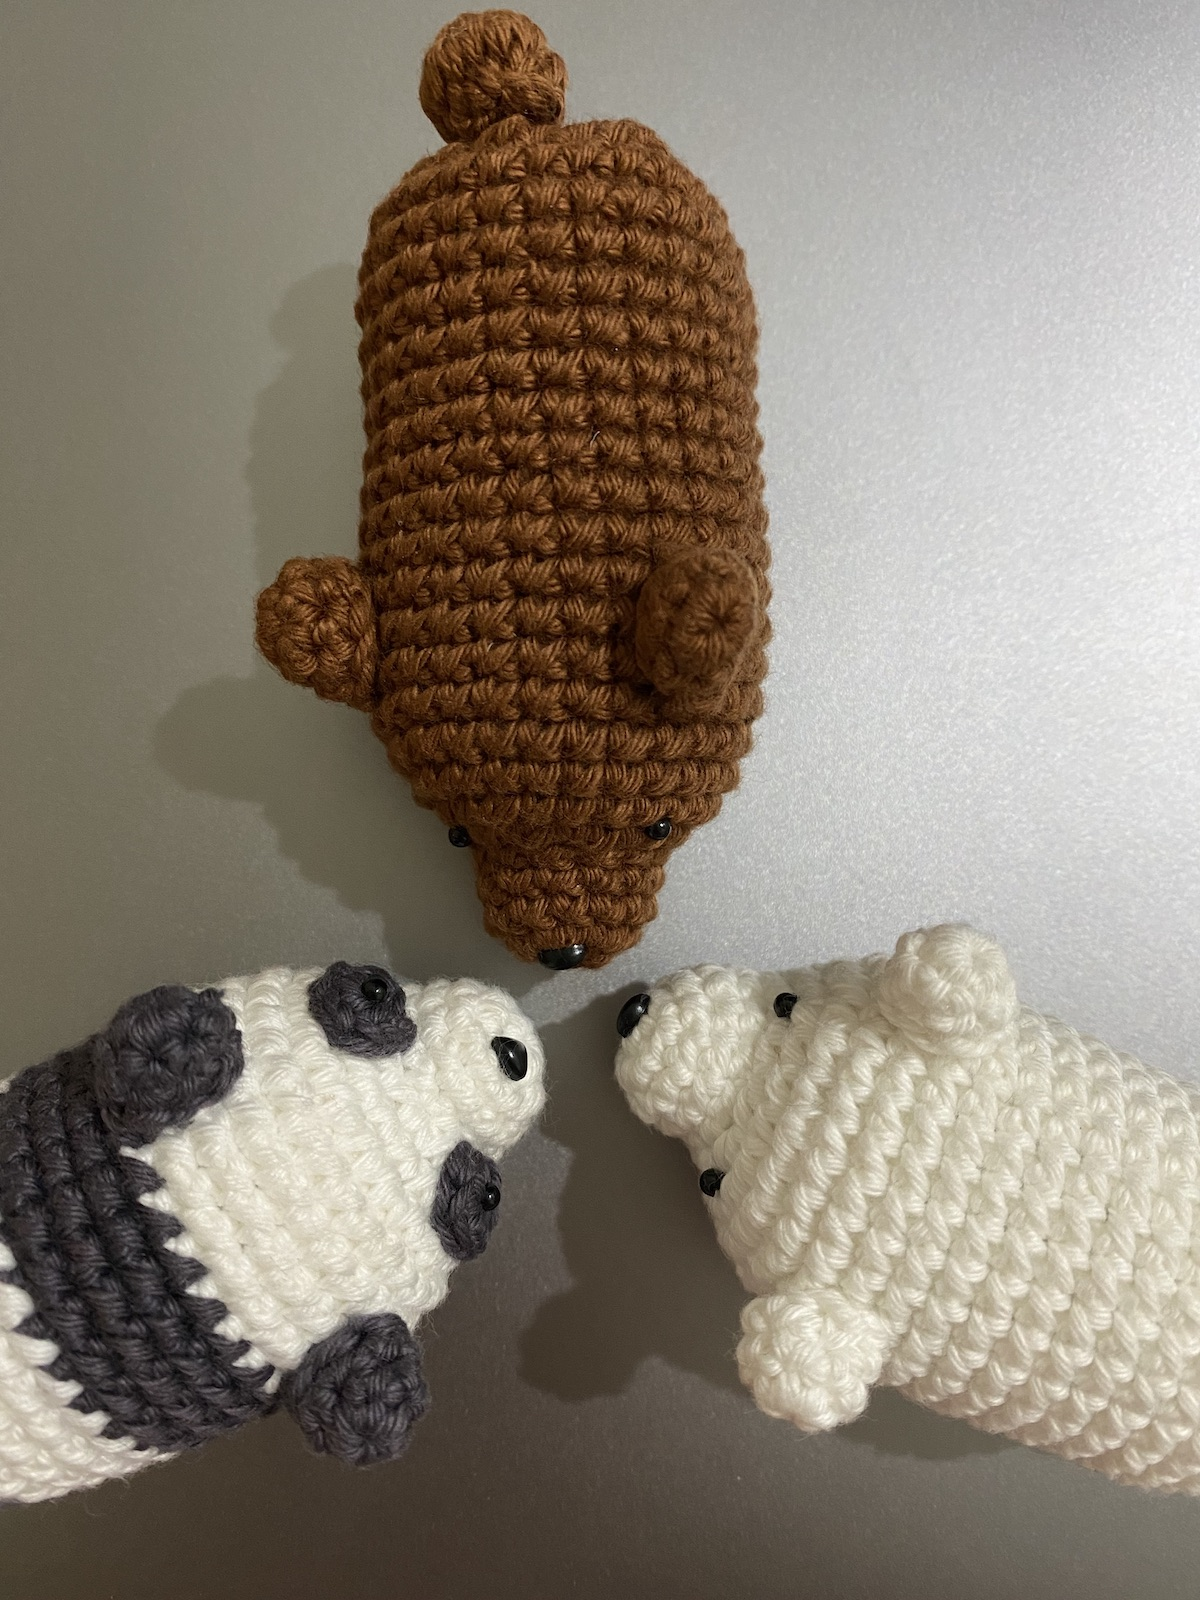 https://storage.googleapis.com/pawlarius-blog-assets/amigurumi/we-bare-bears-chibi/finished-product.jpg